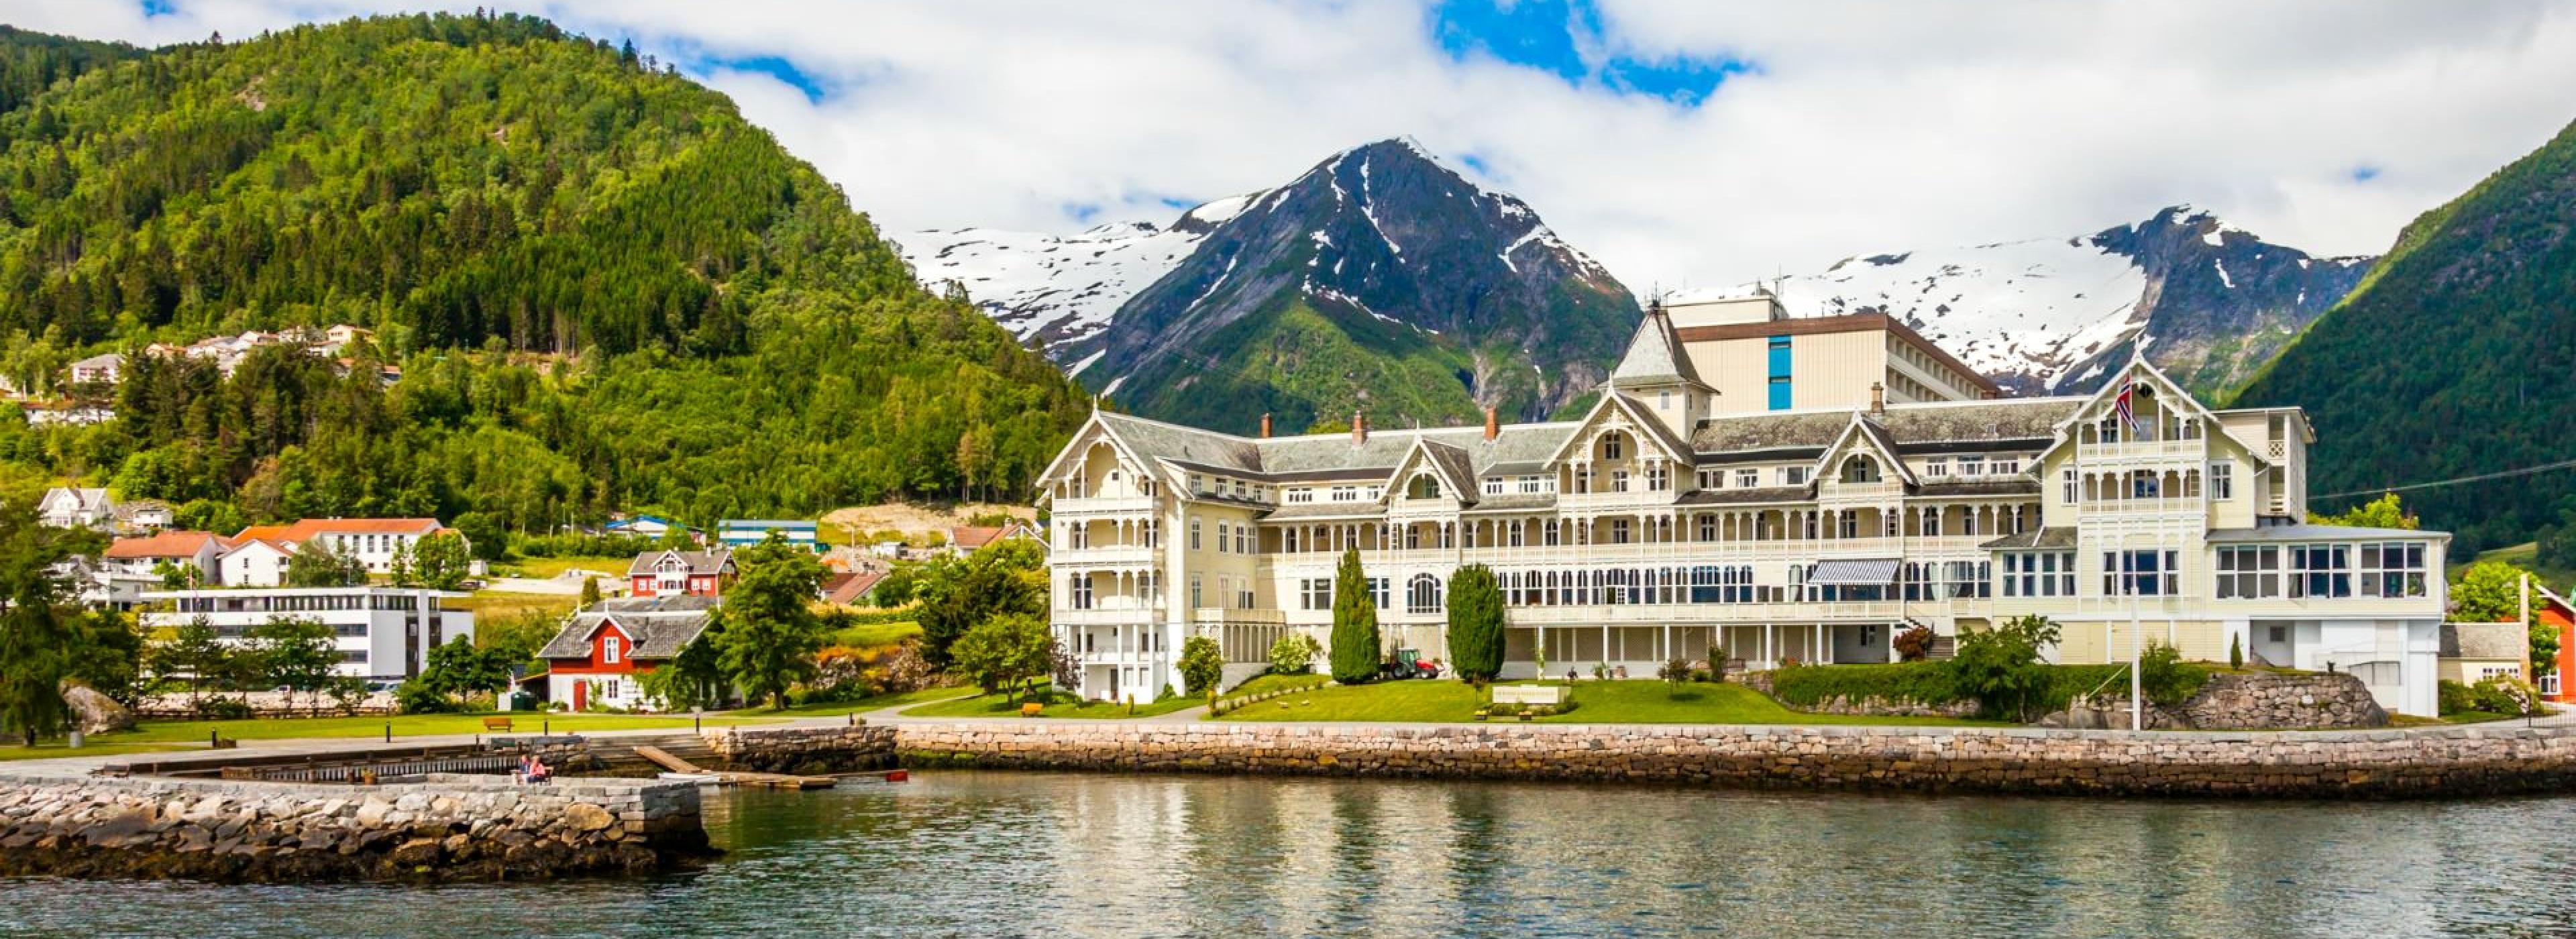 Balestrand, Norway